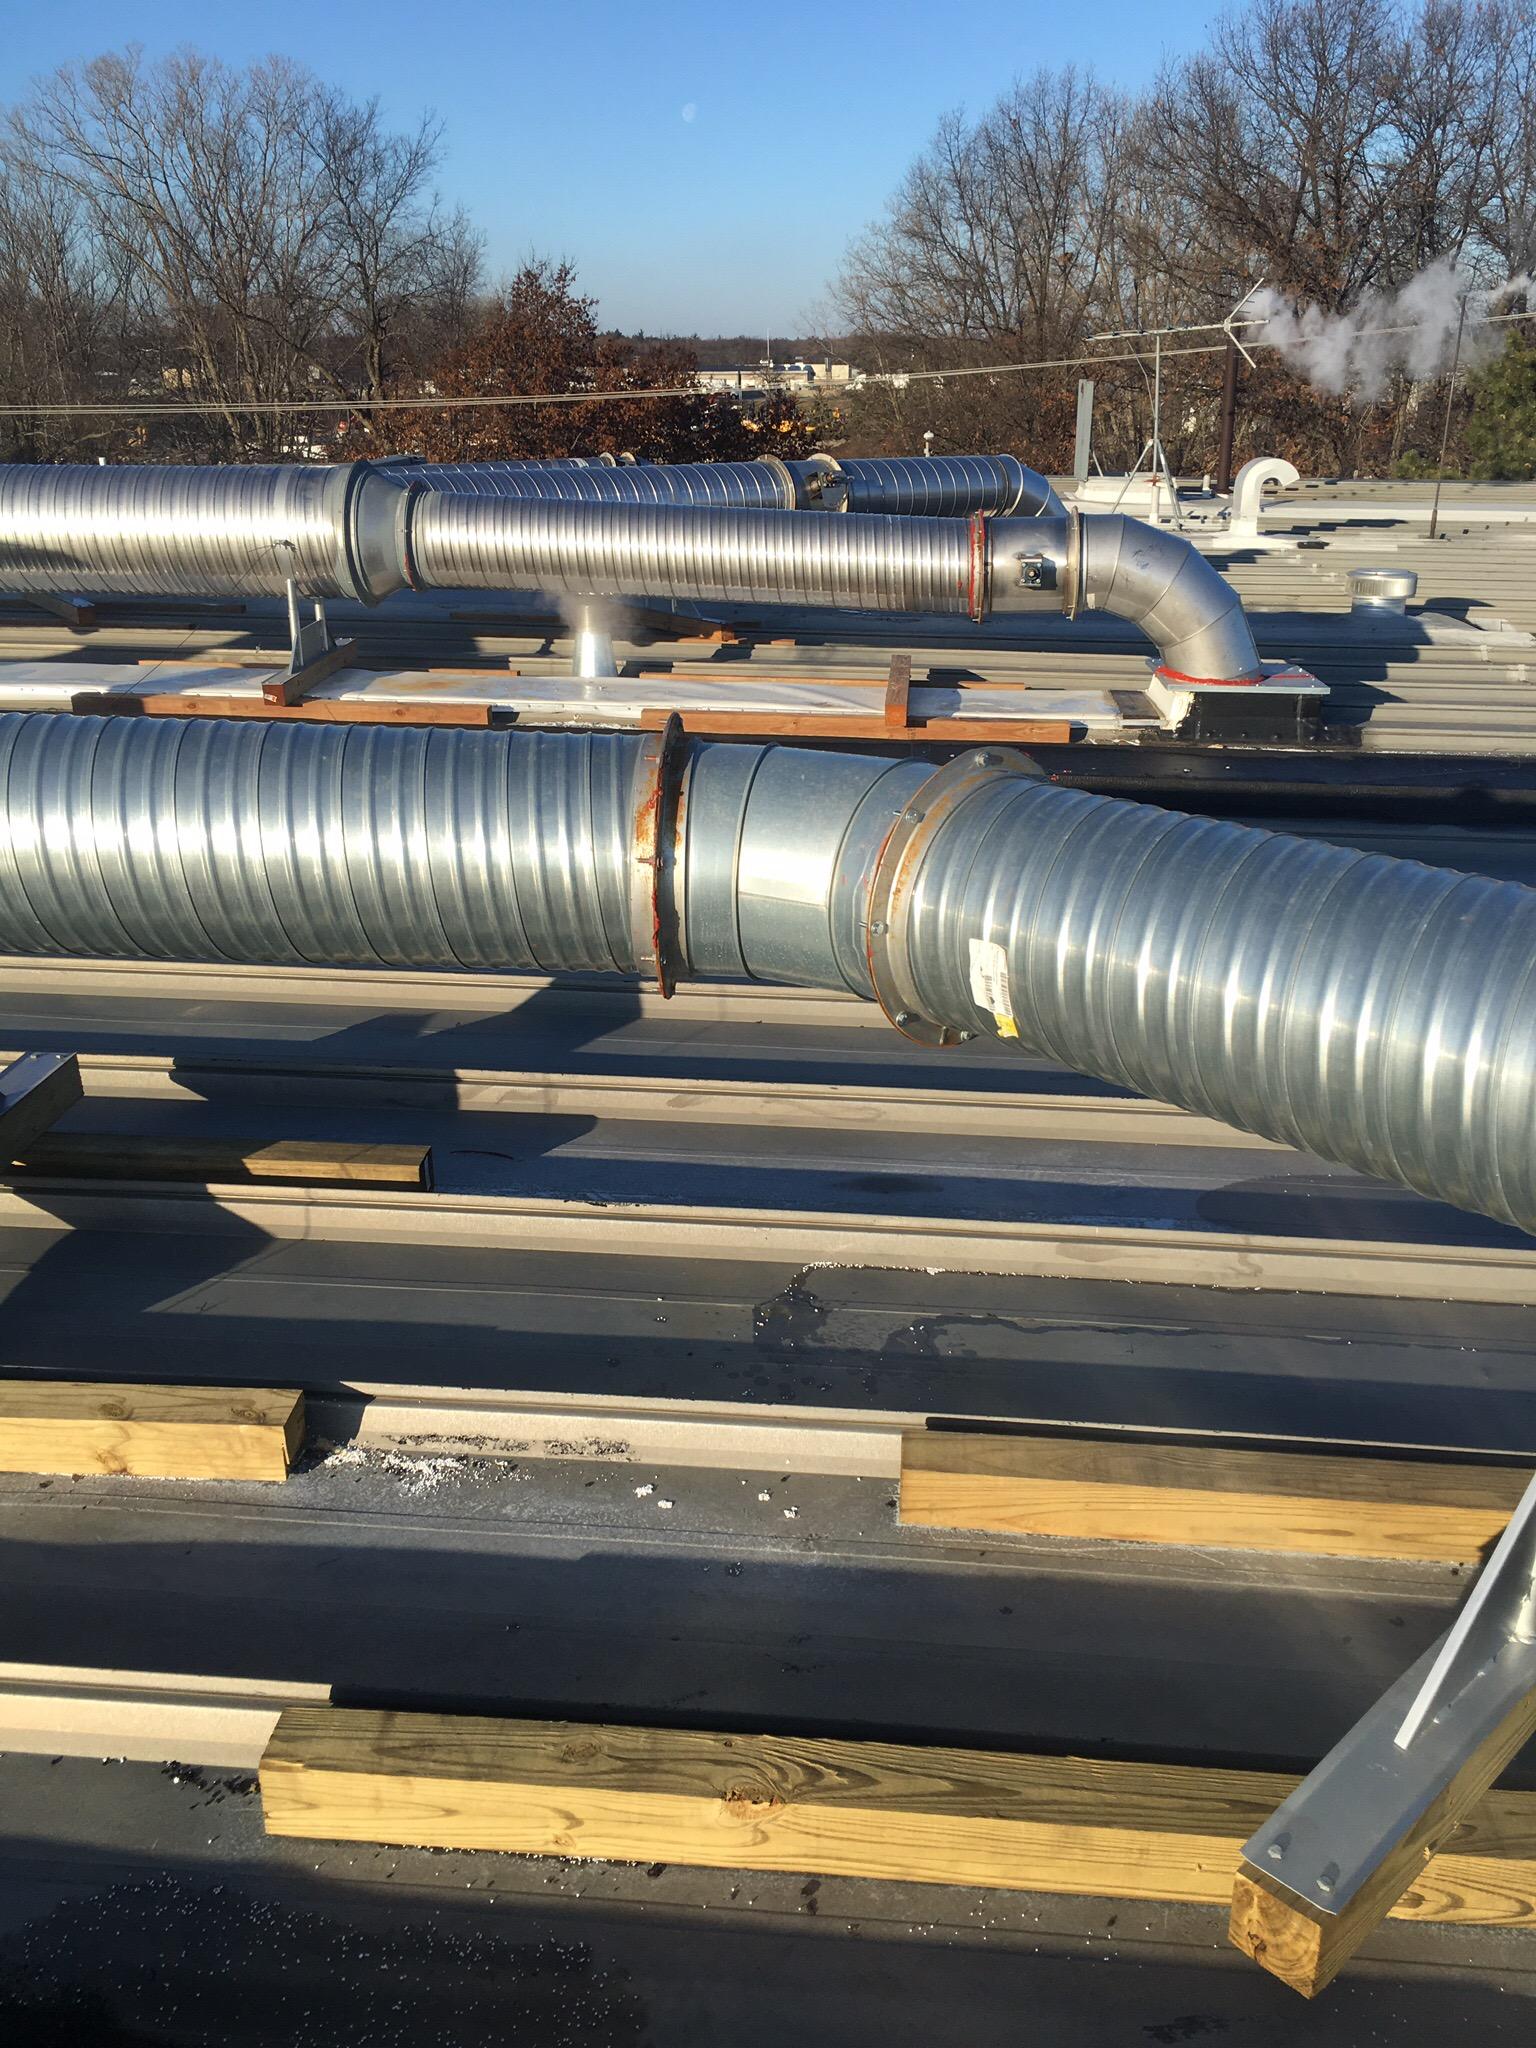 10K SCFM Regenerative Thermal Oxidizer